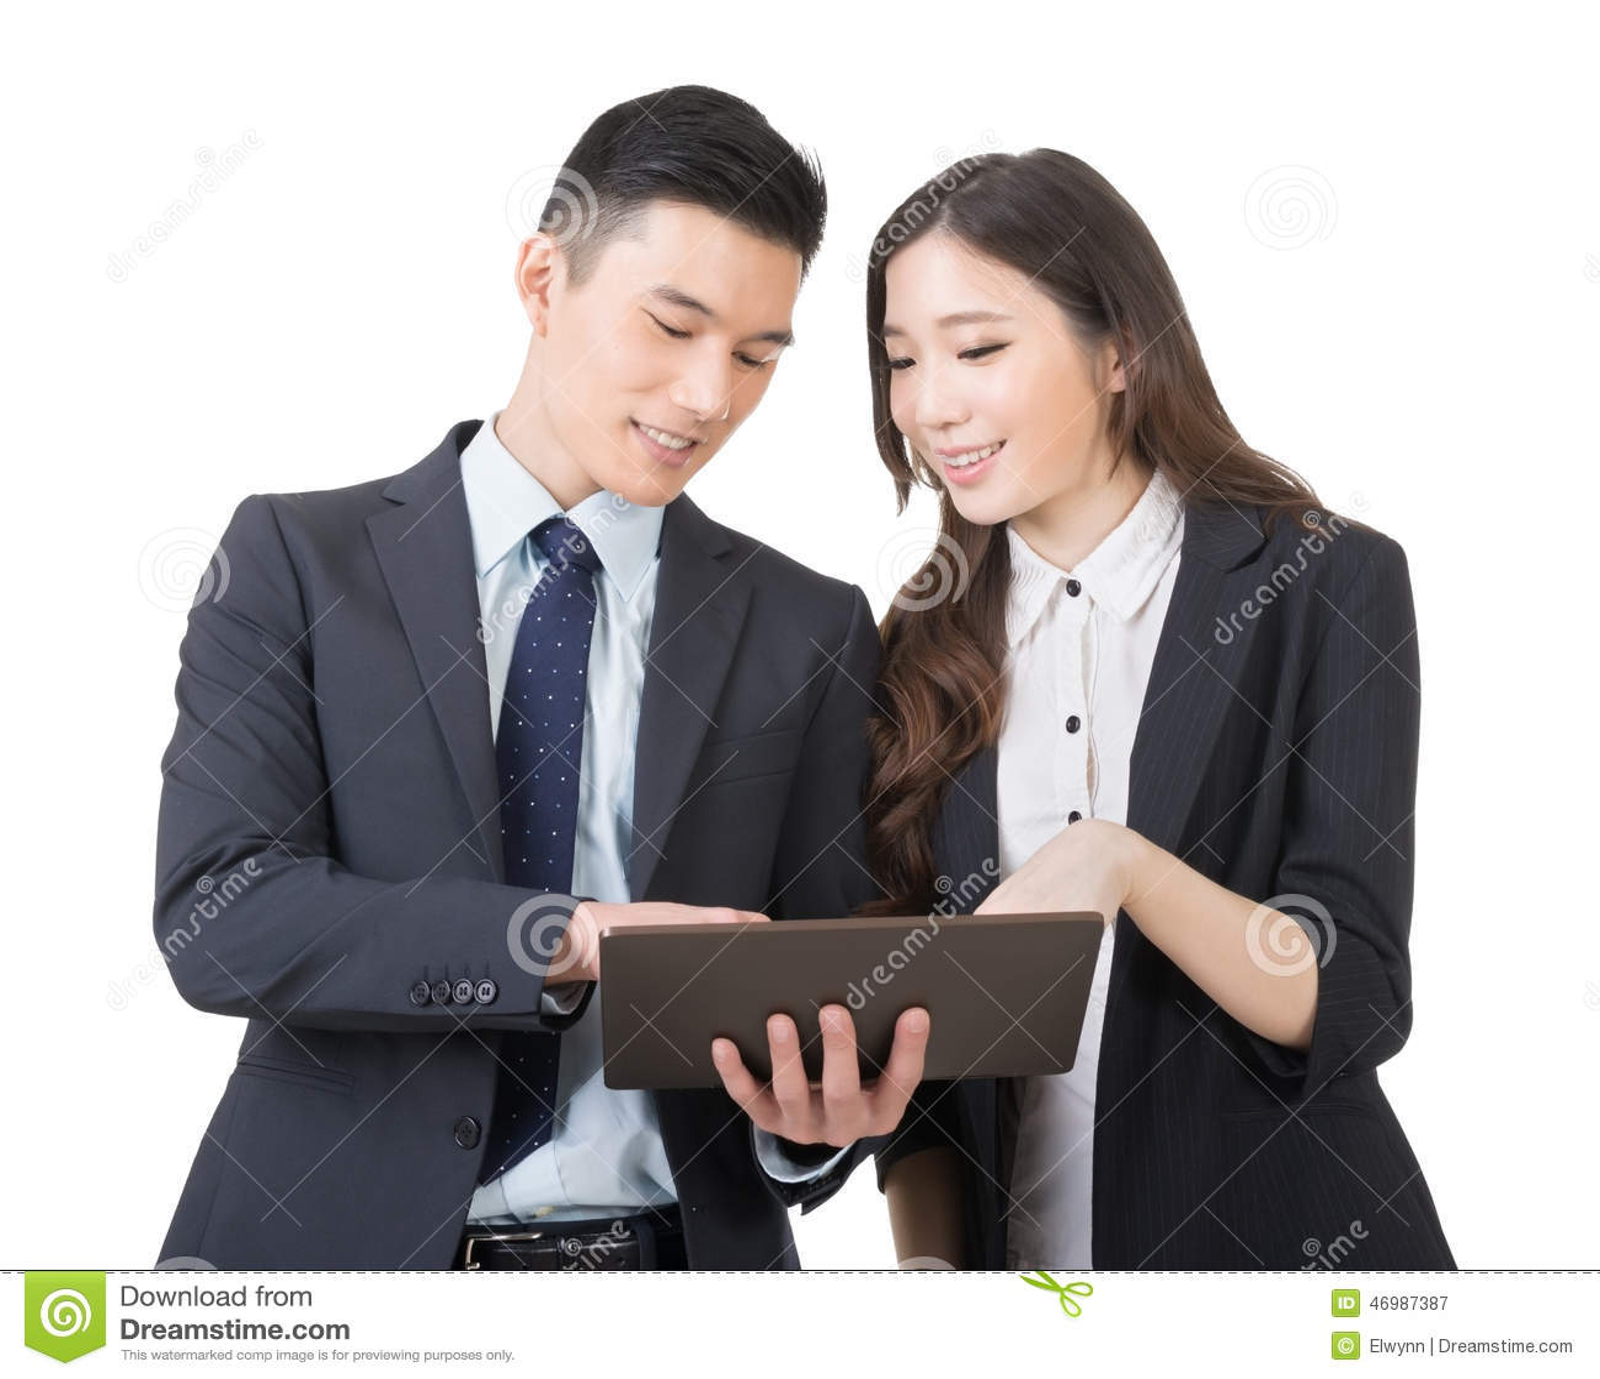 business-man-woman-discuss-men-women-hold-tablet-closeup-portrait-copyspace-46987387.jpg